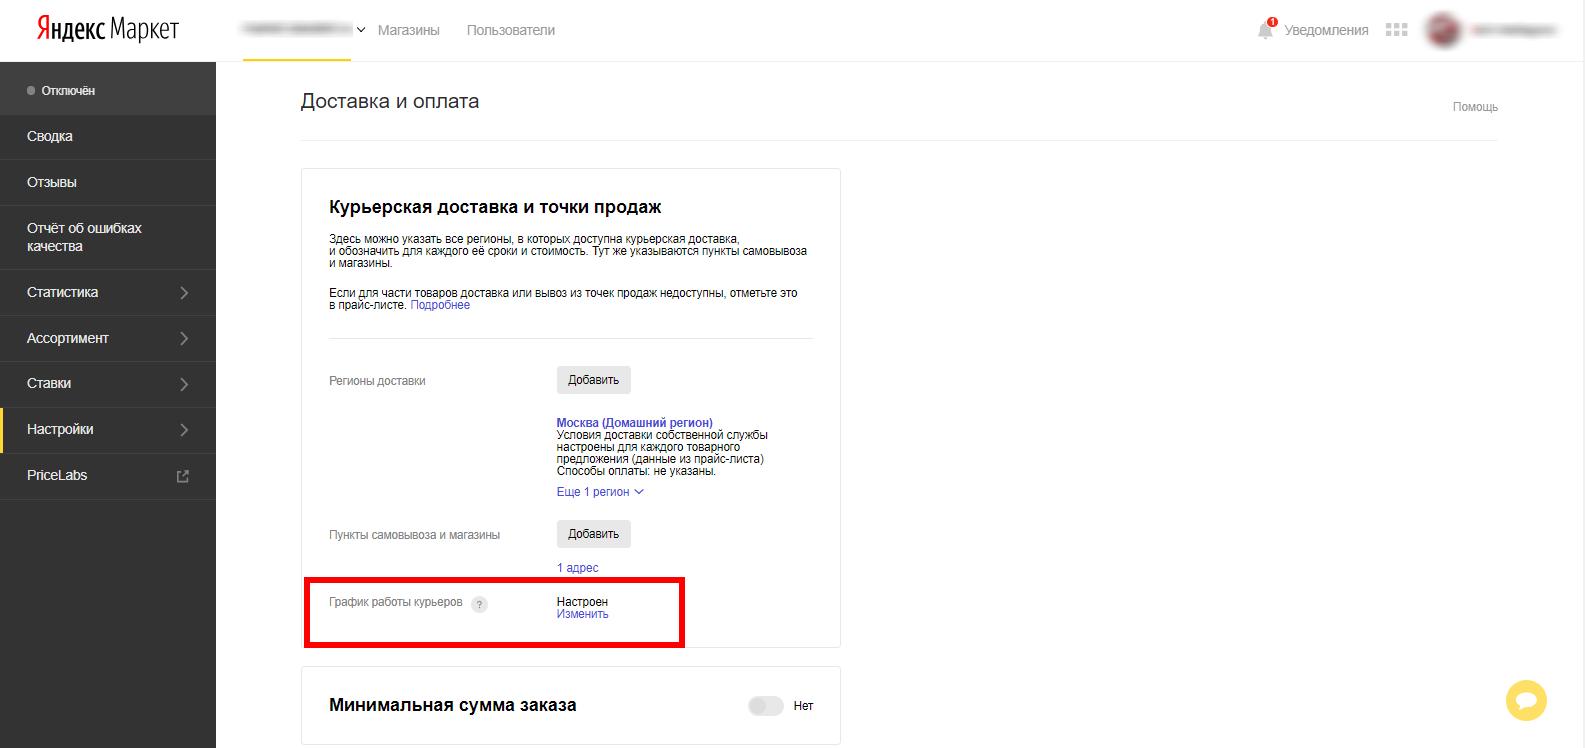 Яндекс Маркет Интернет Магазин Доставка Курьером